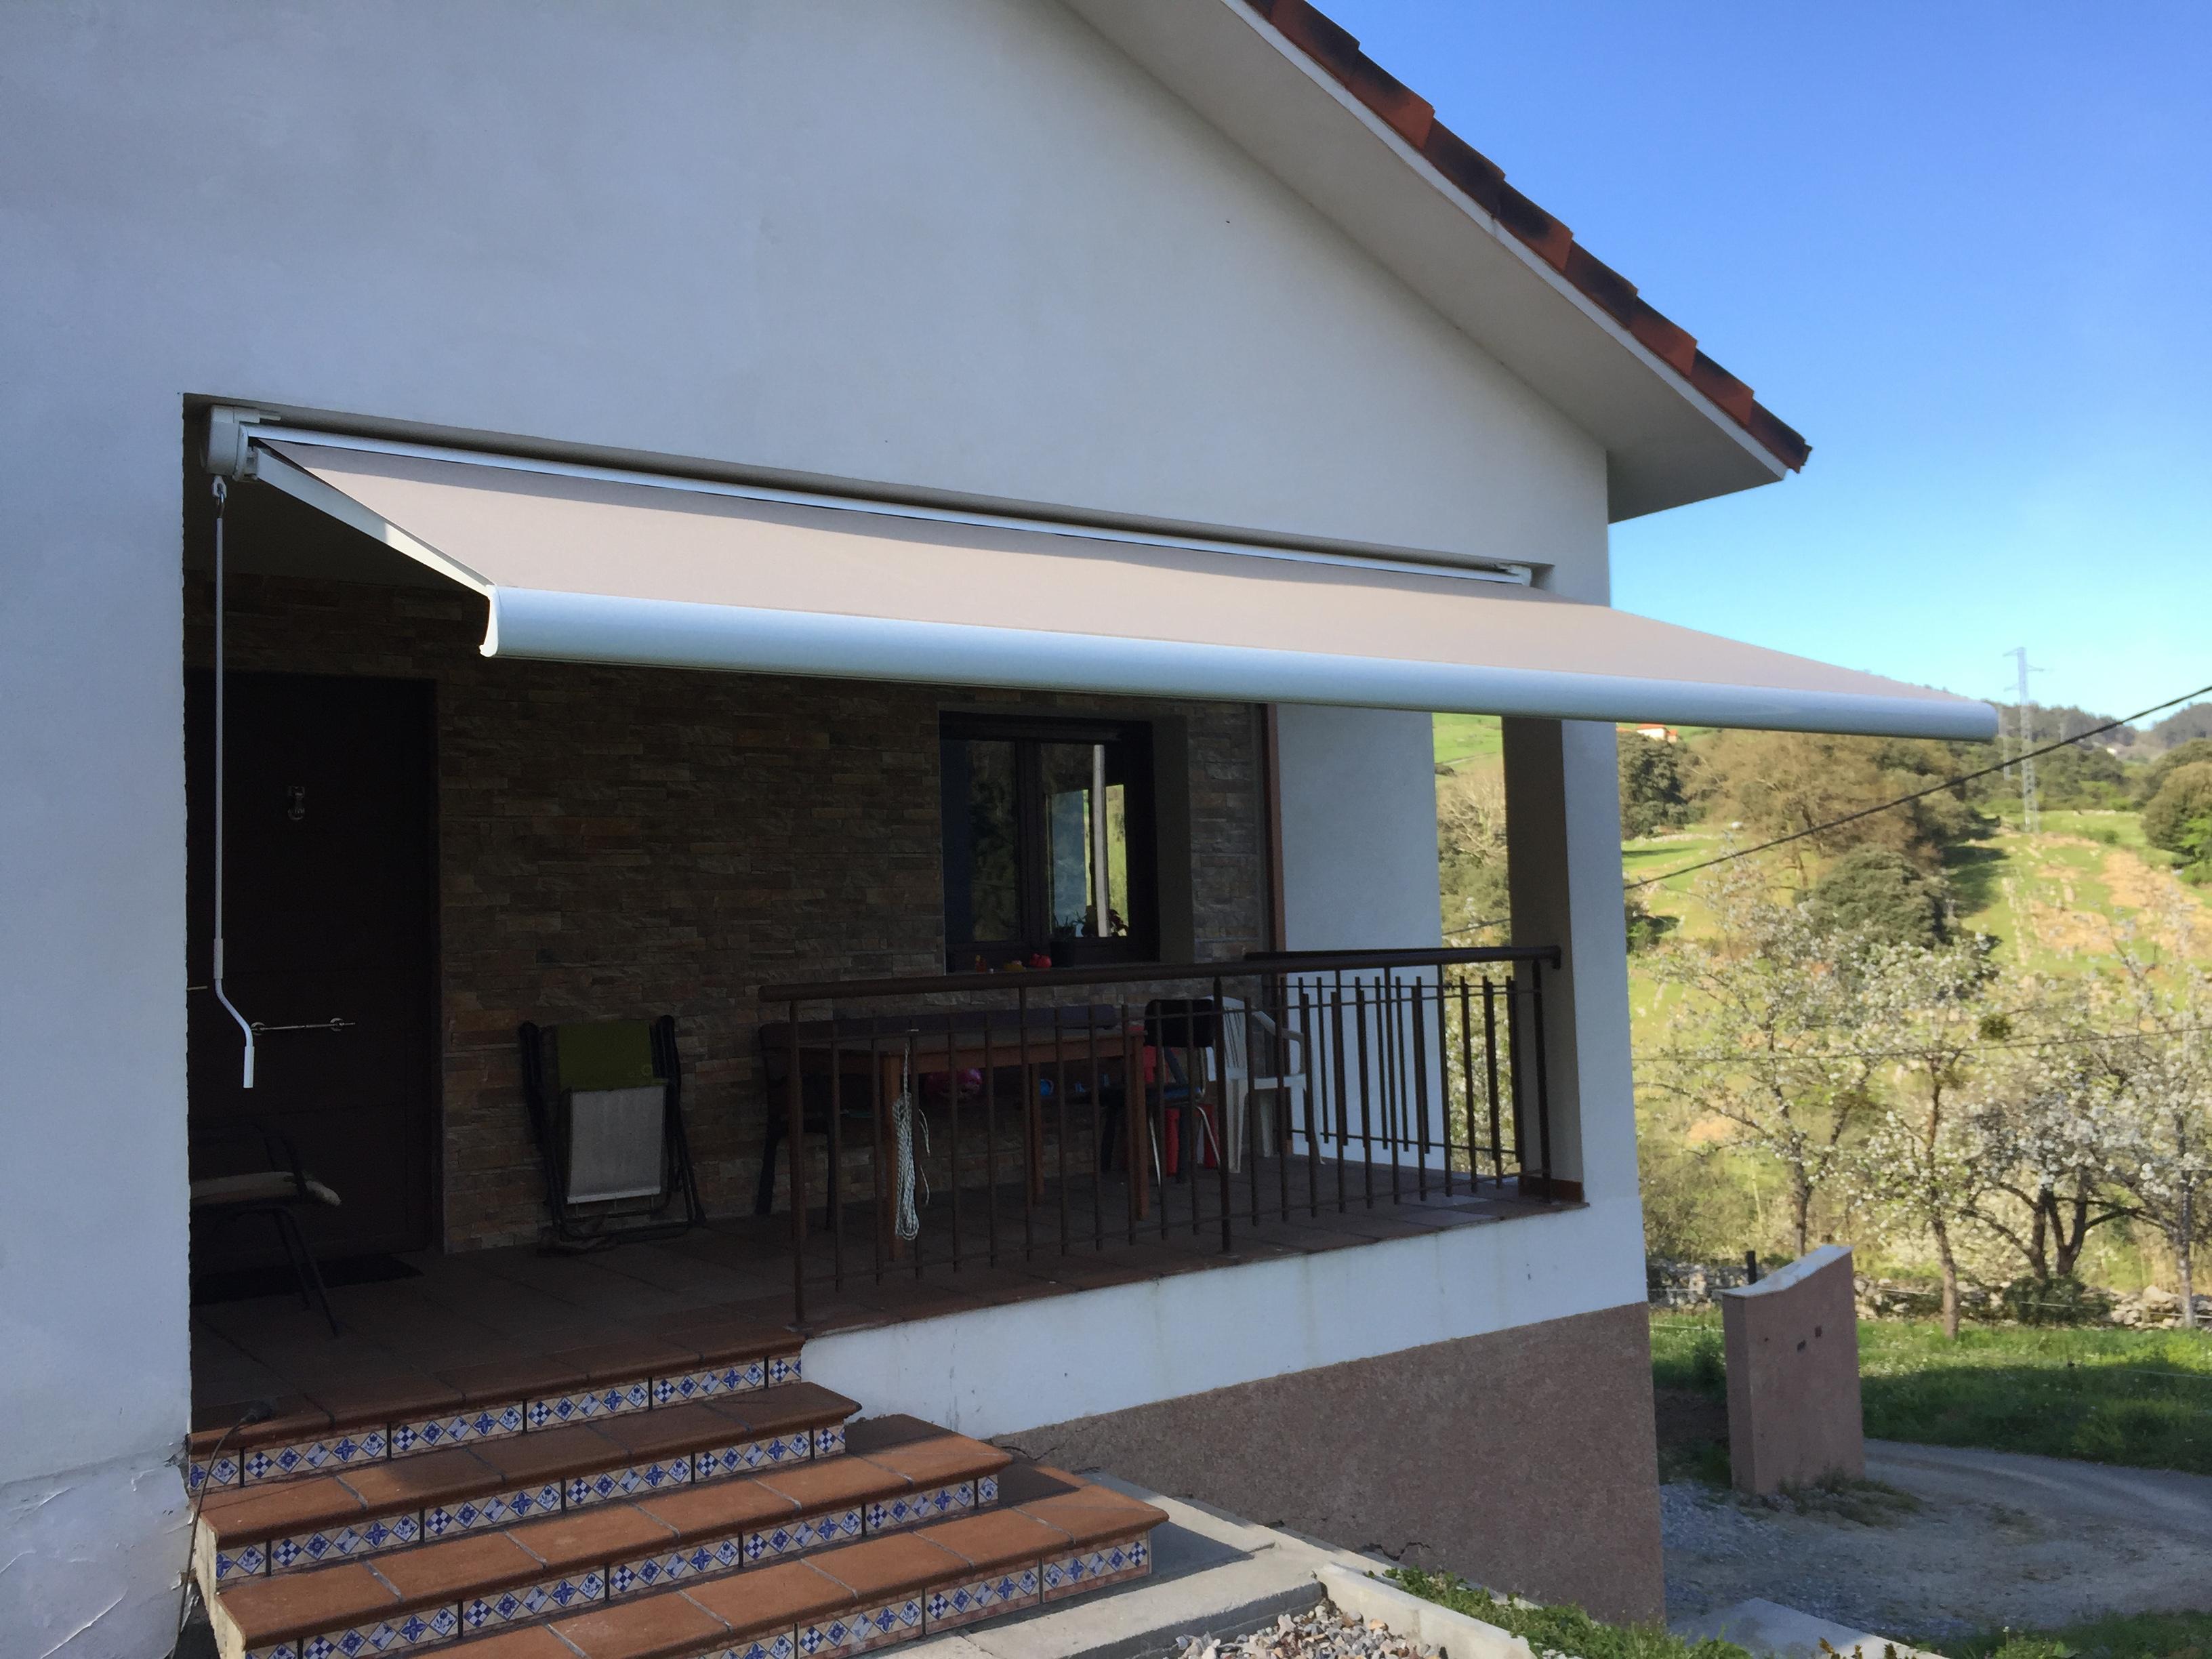 Toldo cofre en avil s modelo storbox 300 toldos en asturias - Tendedero magor ...